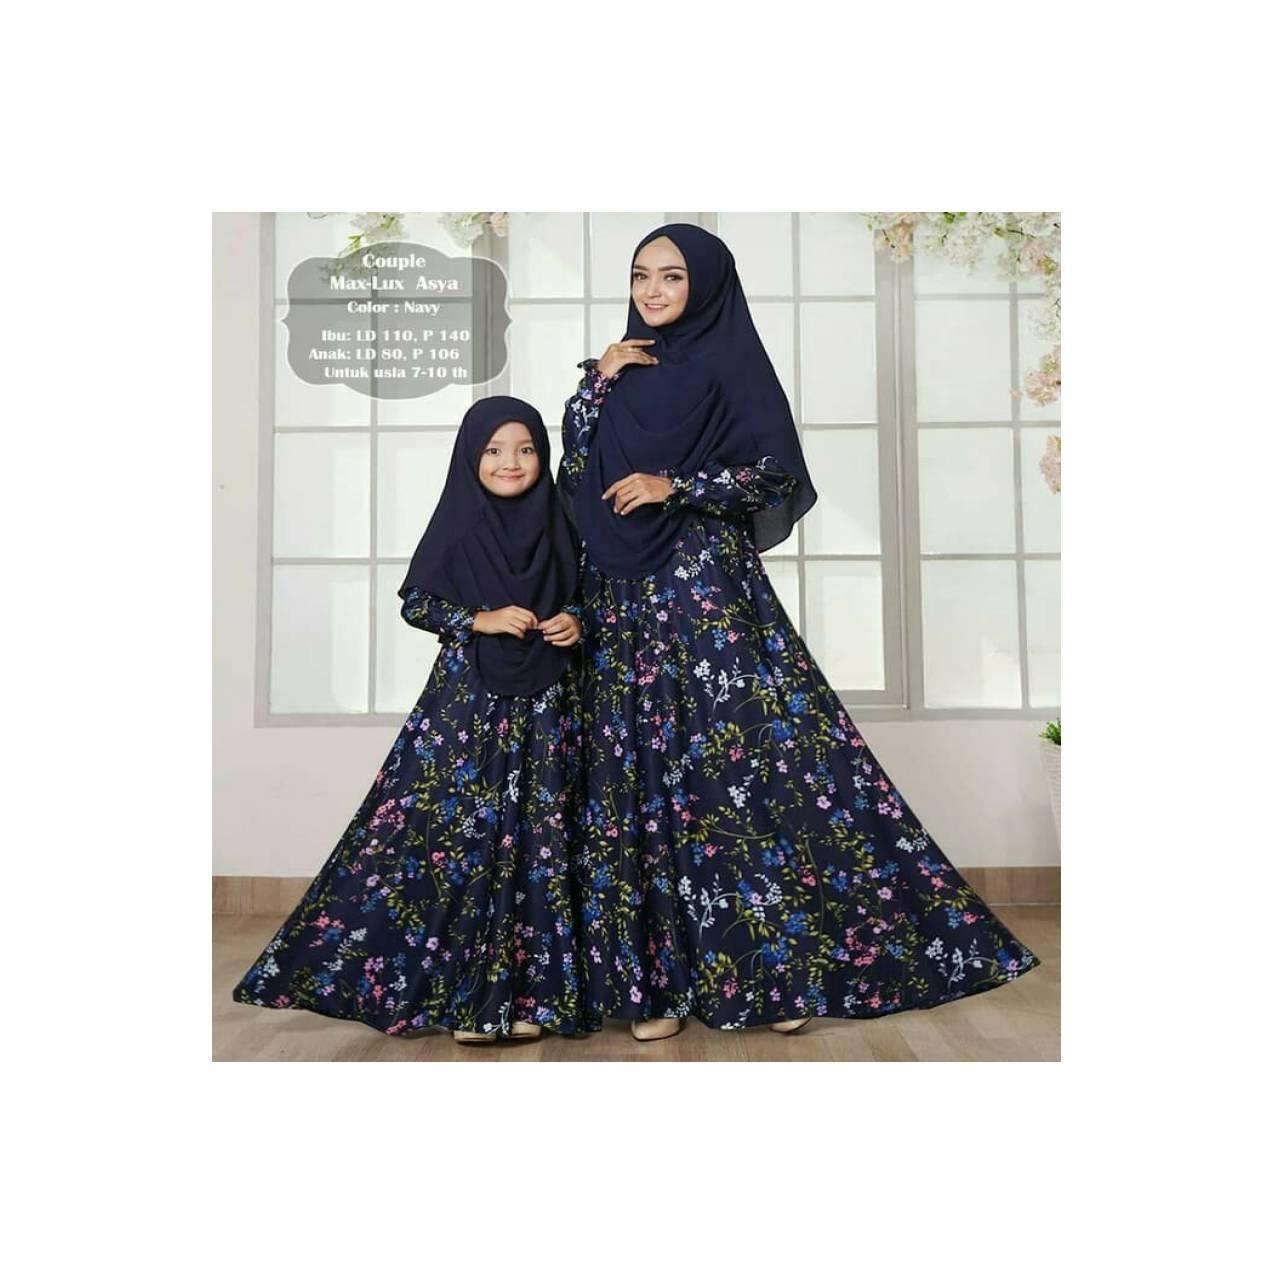 baju Couple gamis syari Murah / maxi dress pesta ibu anak asyya navy